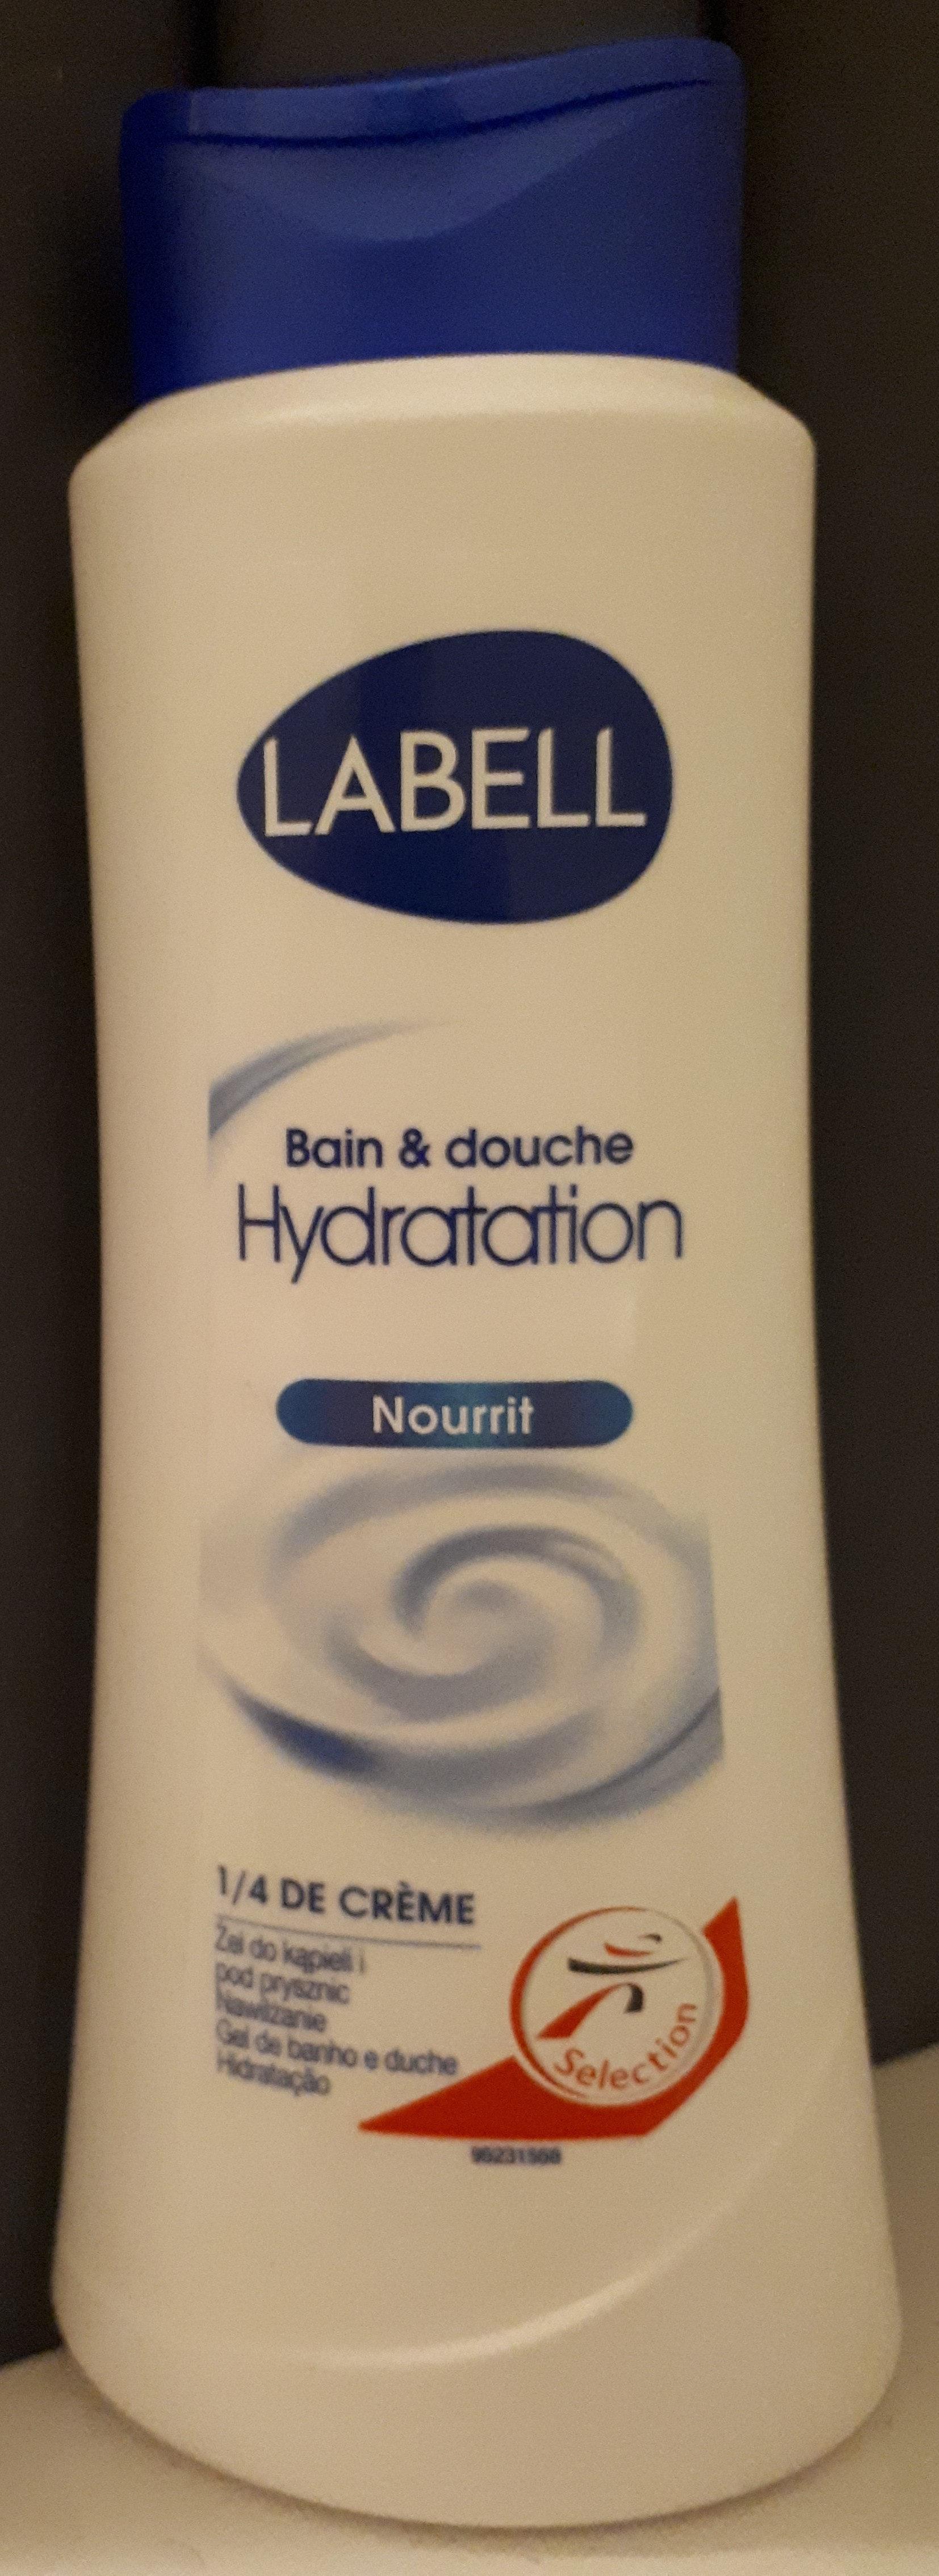 Bain et douche Hydratation - Ingredients - fr